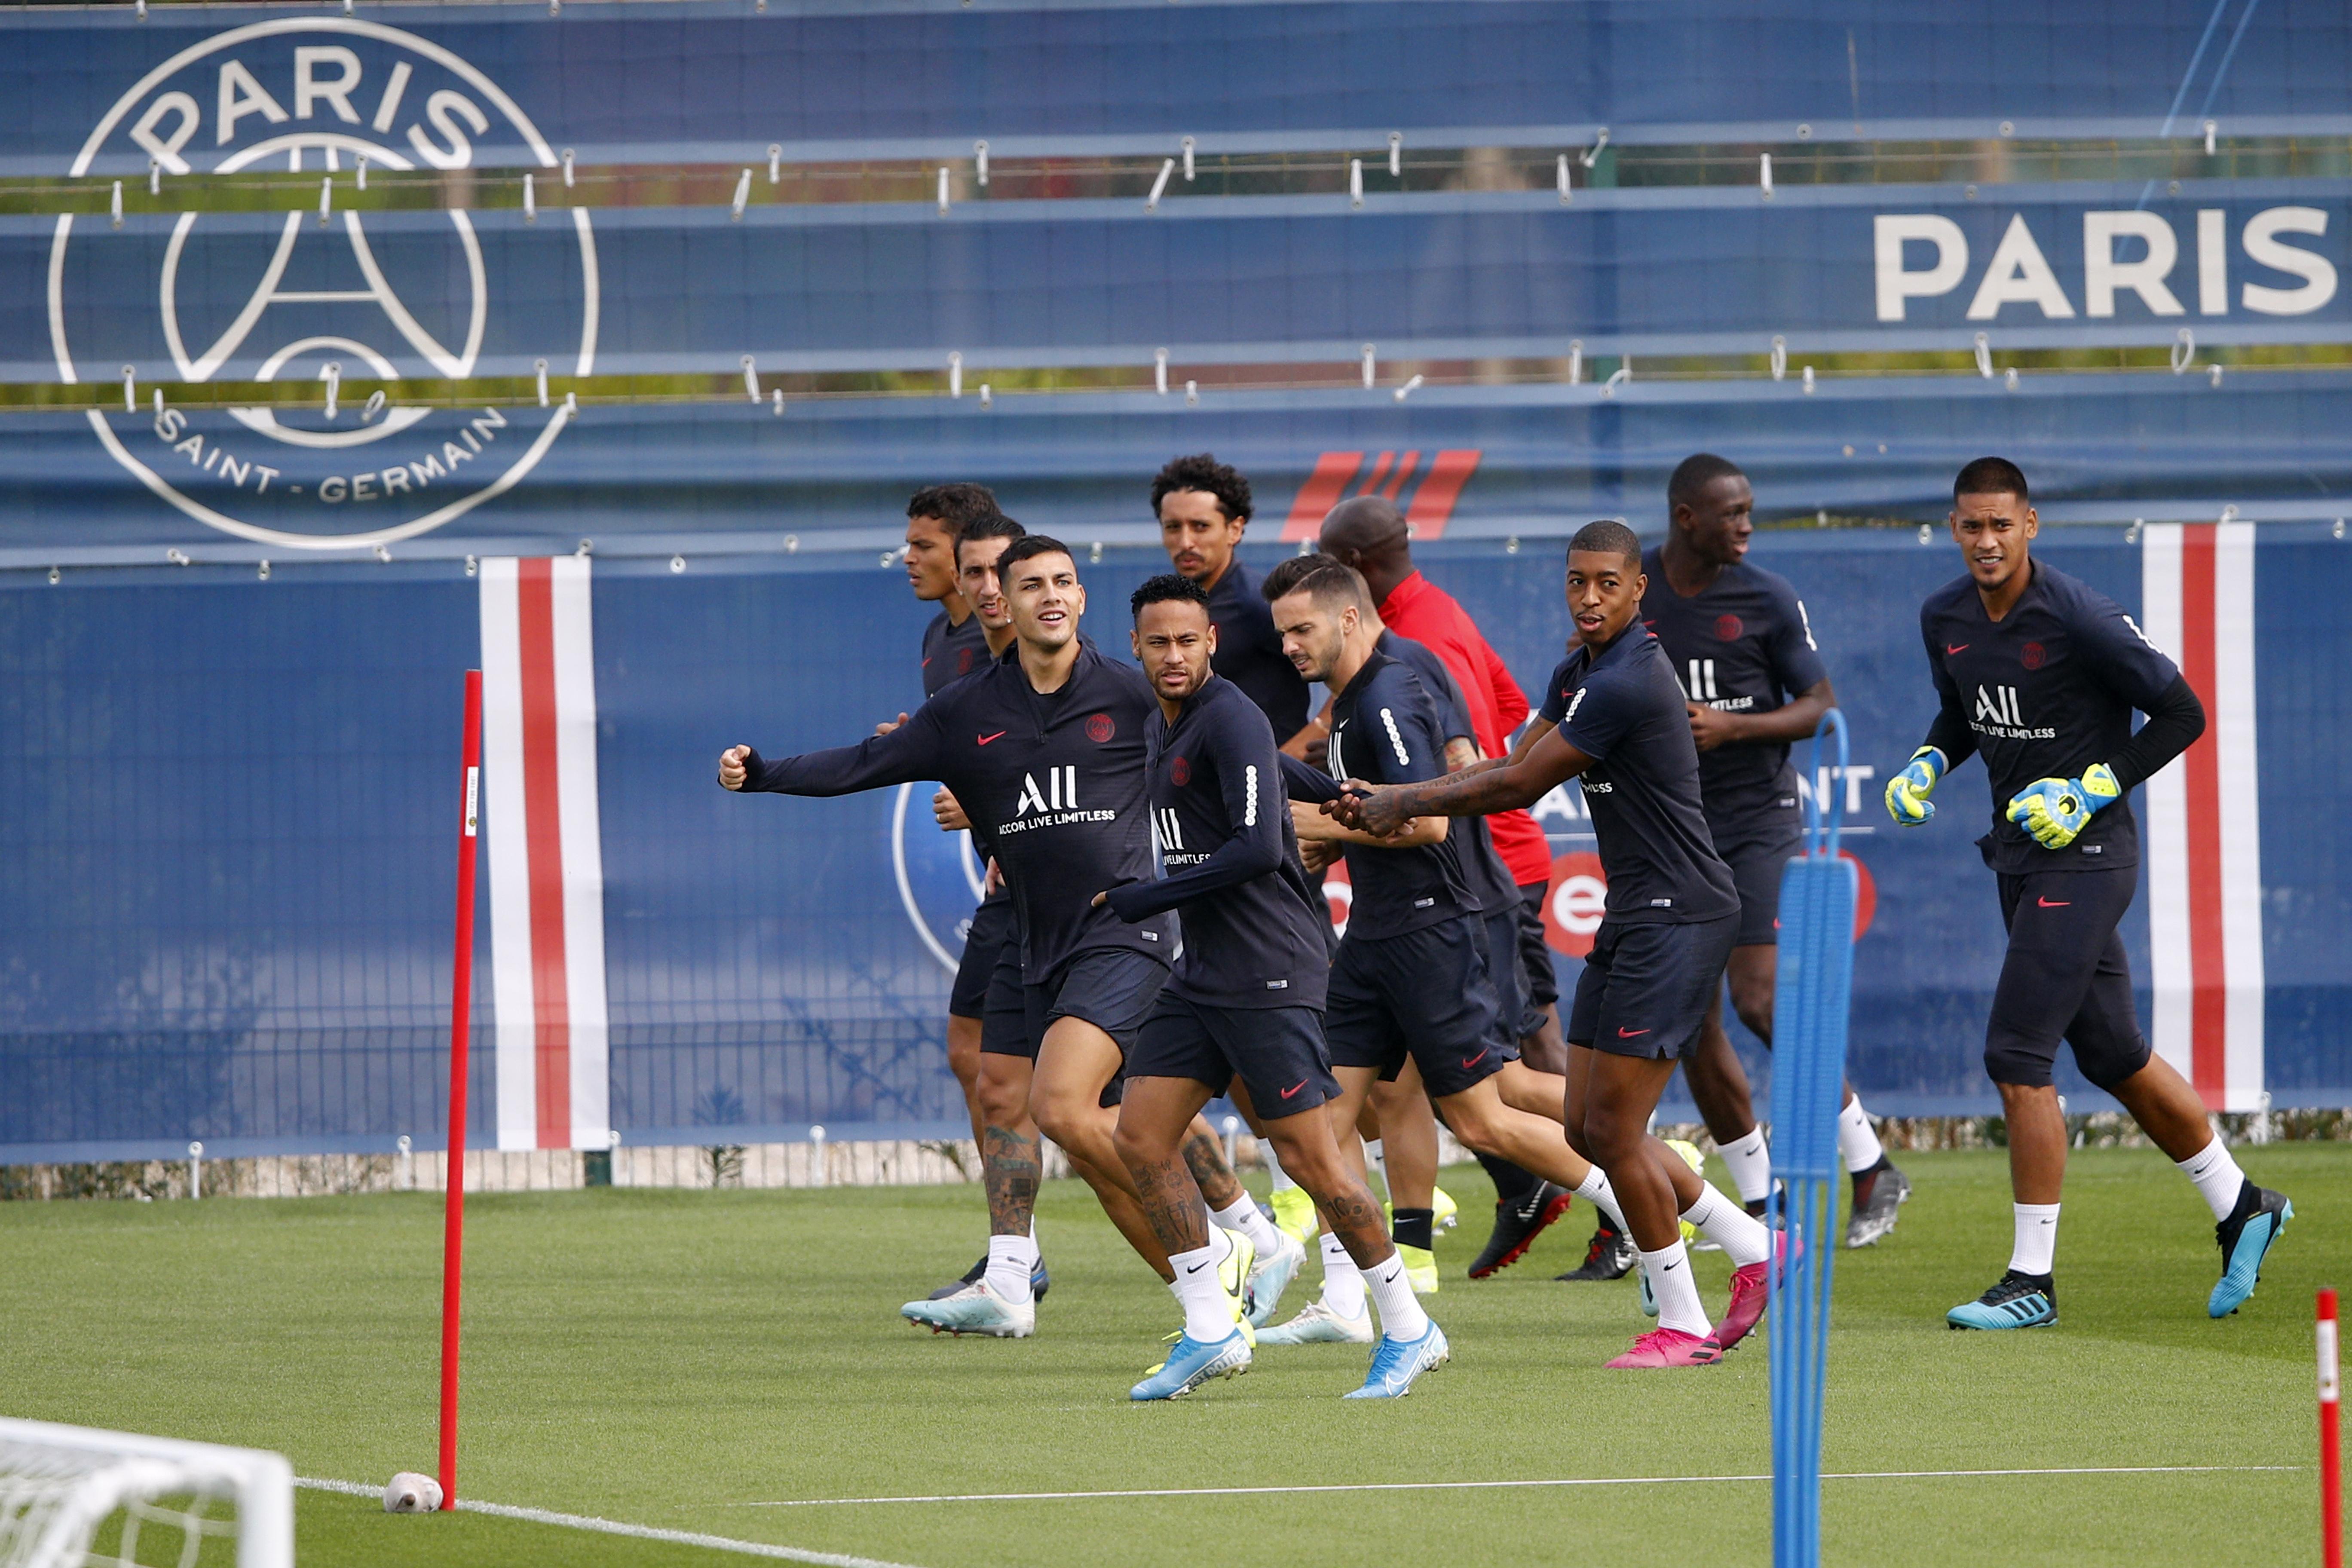 Neymar to miss start of French league amid transfer talk